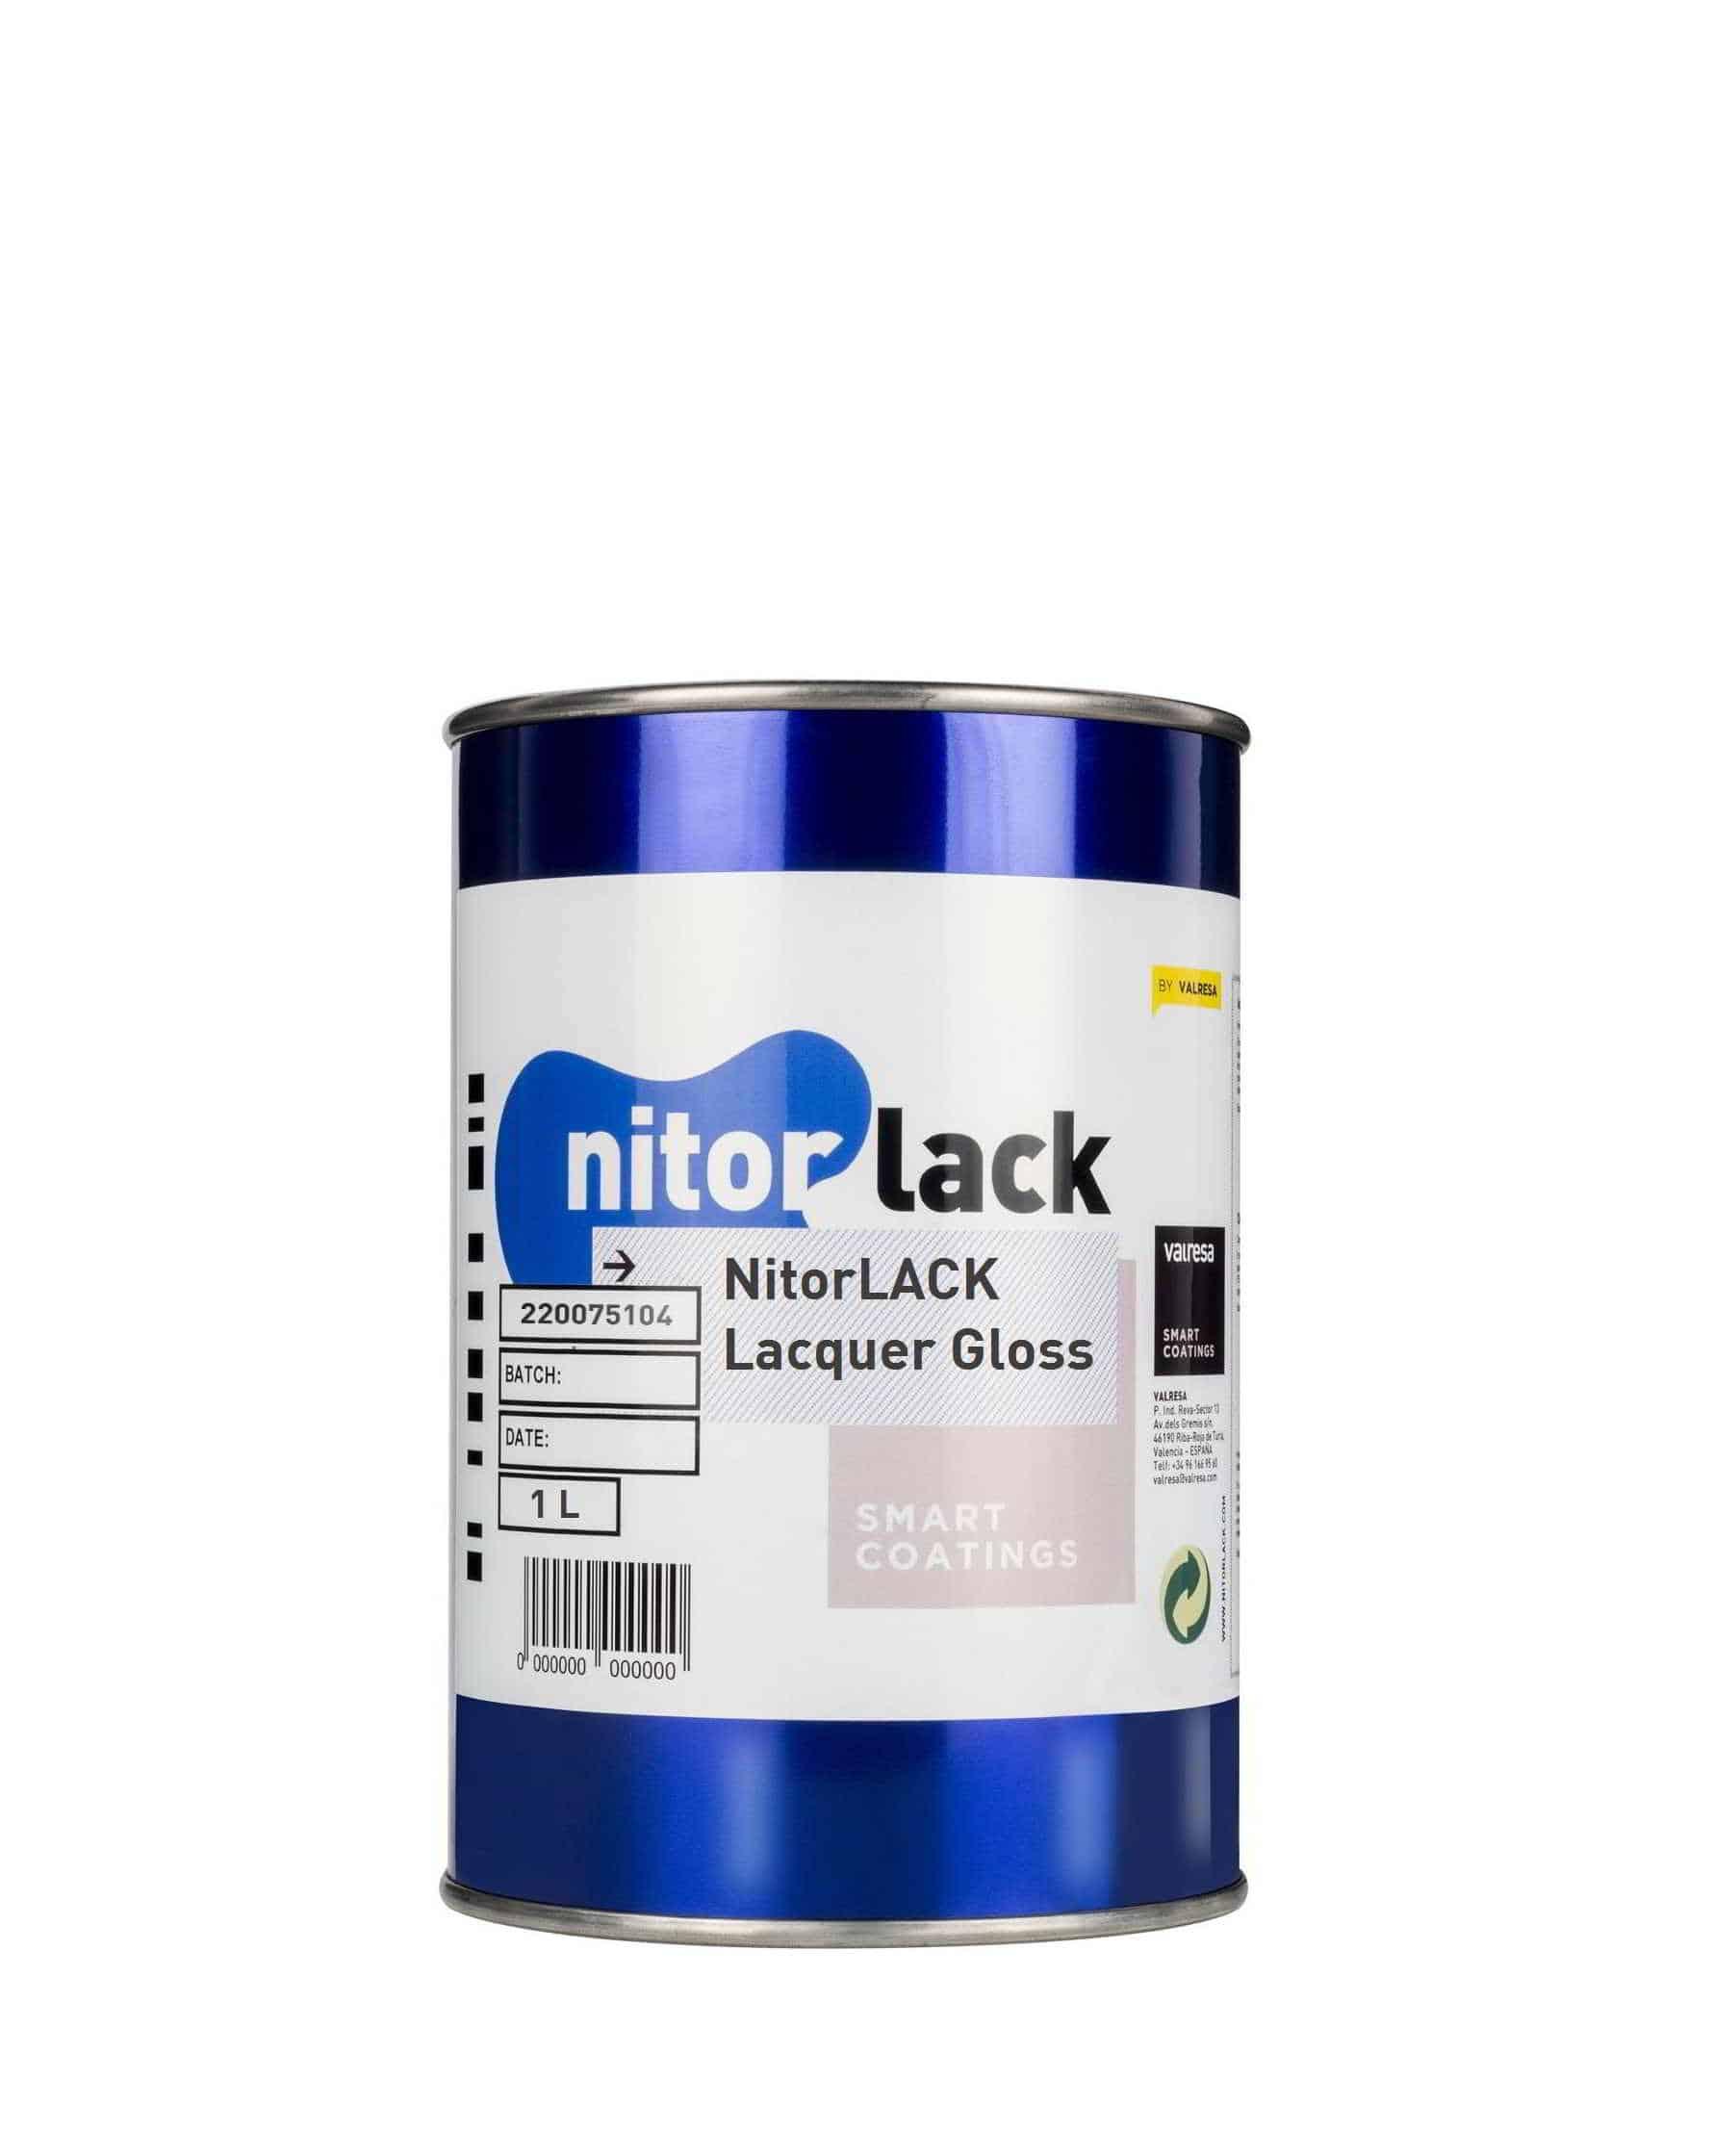 NitorLACK LACQUER GLOSS